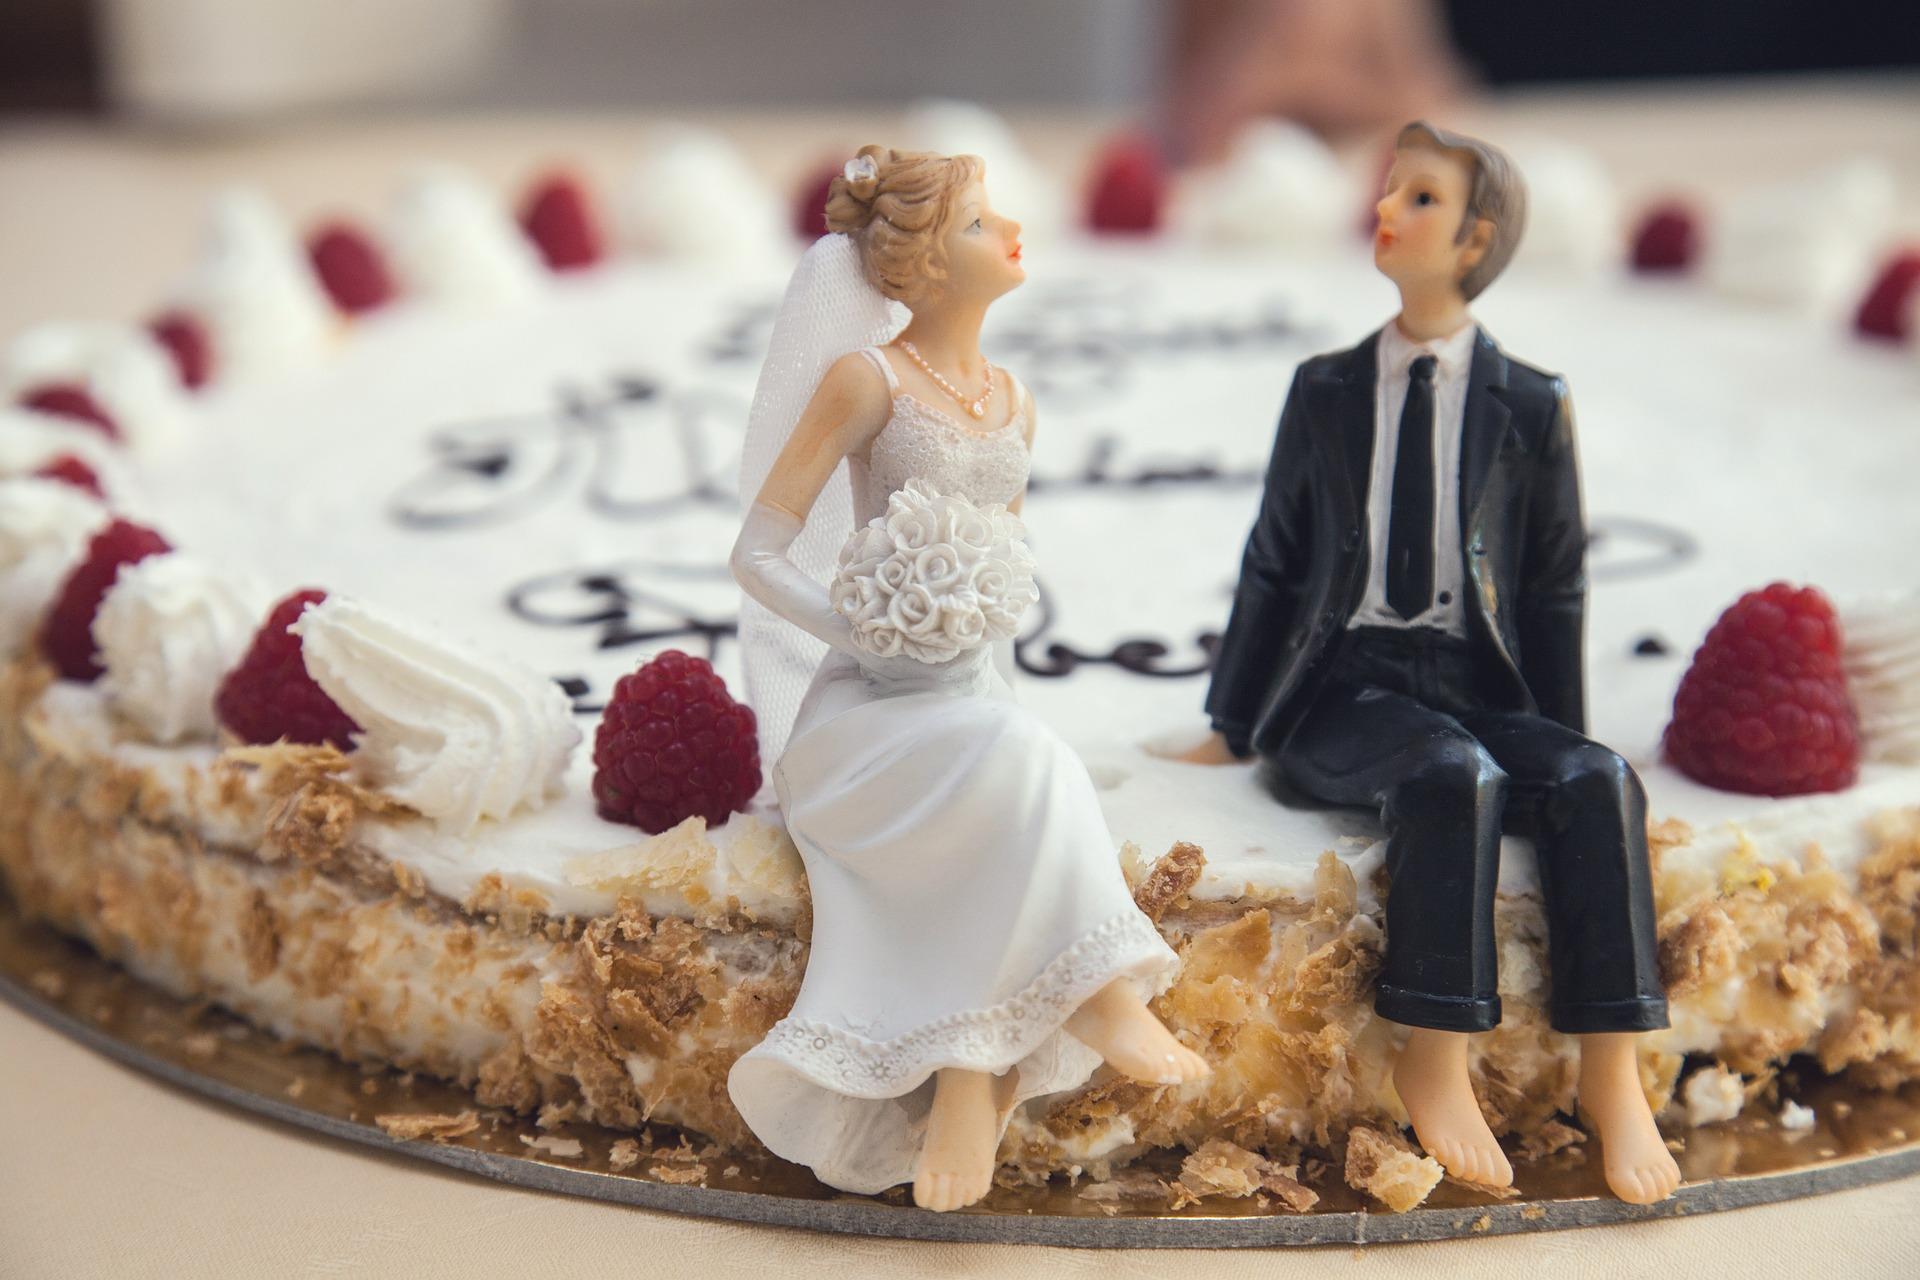 wedding-cake-407170_1920.jpg